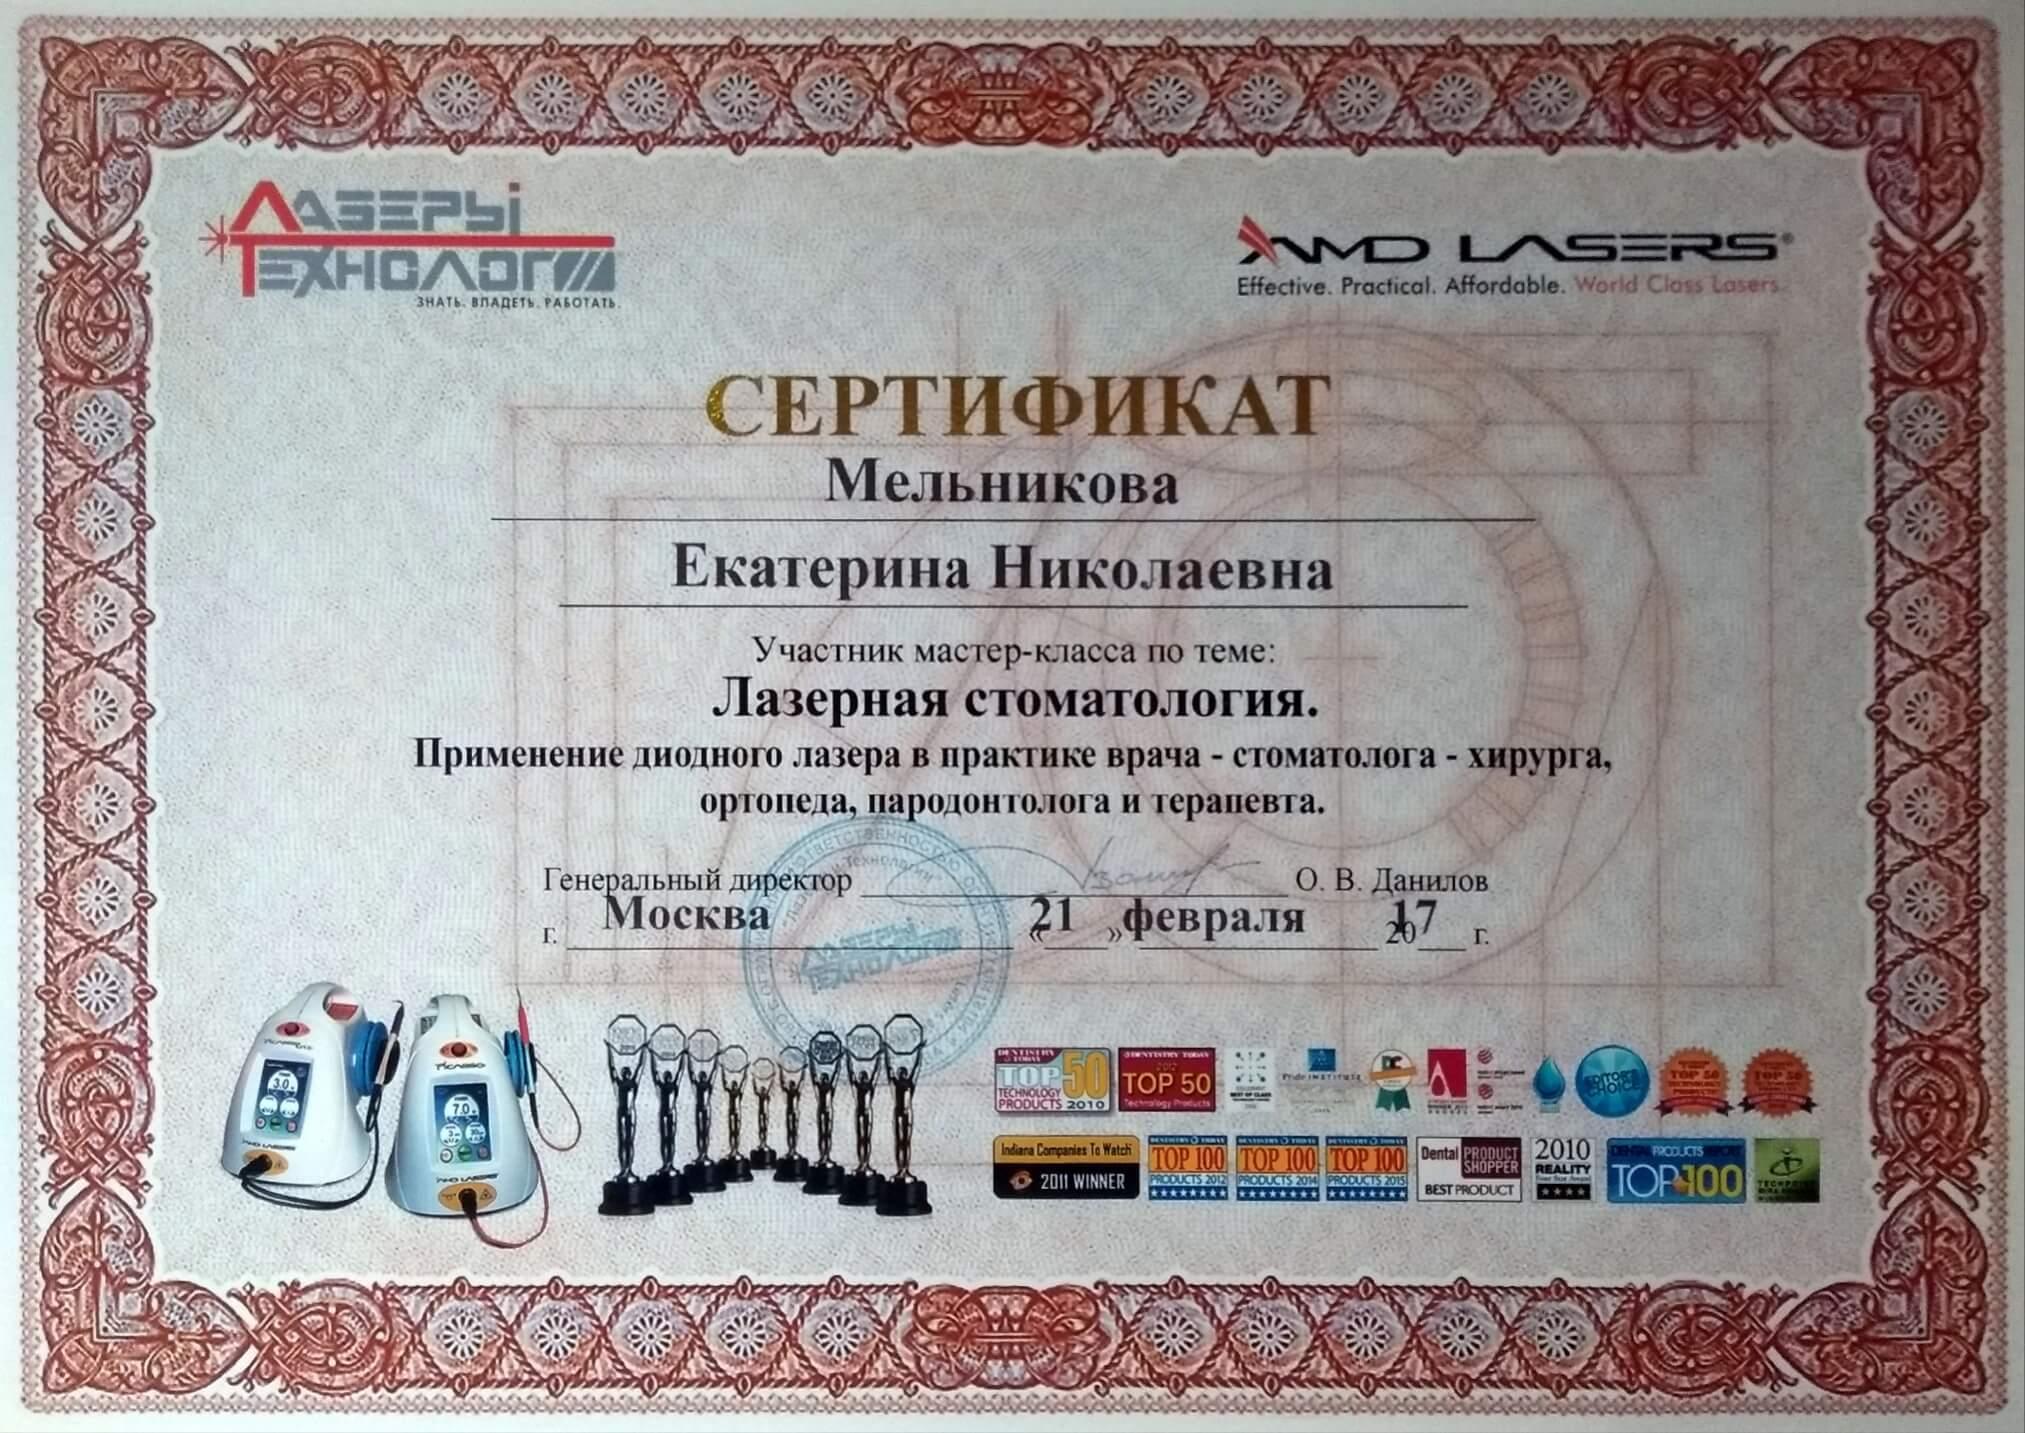 Куликова В. С. — сертификат №7